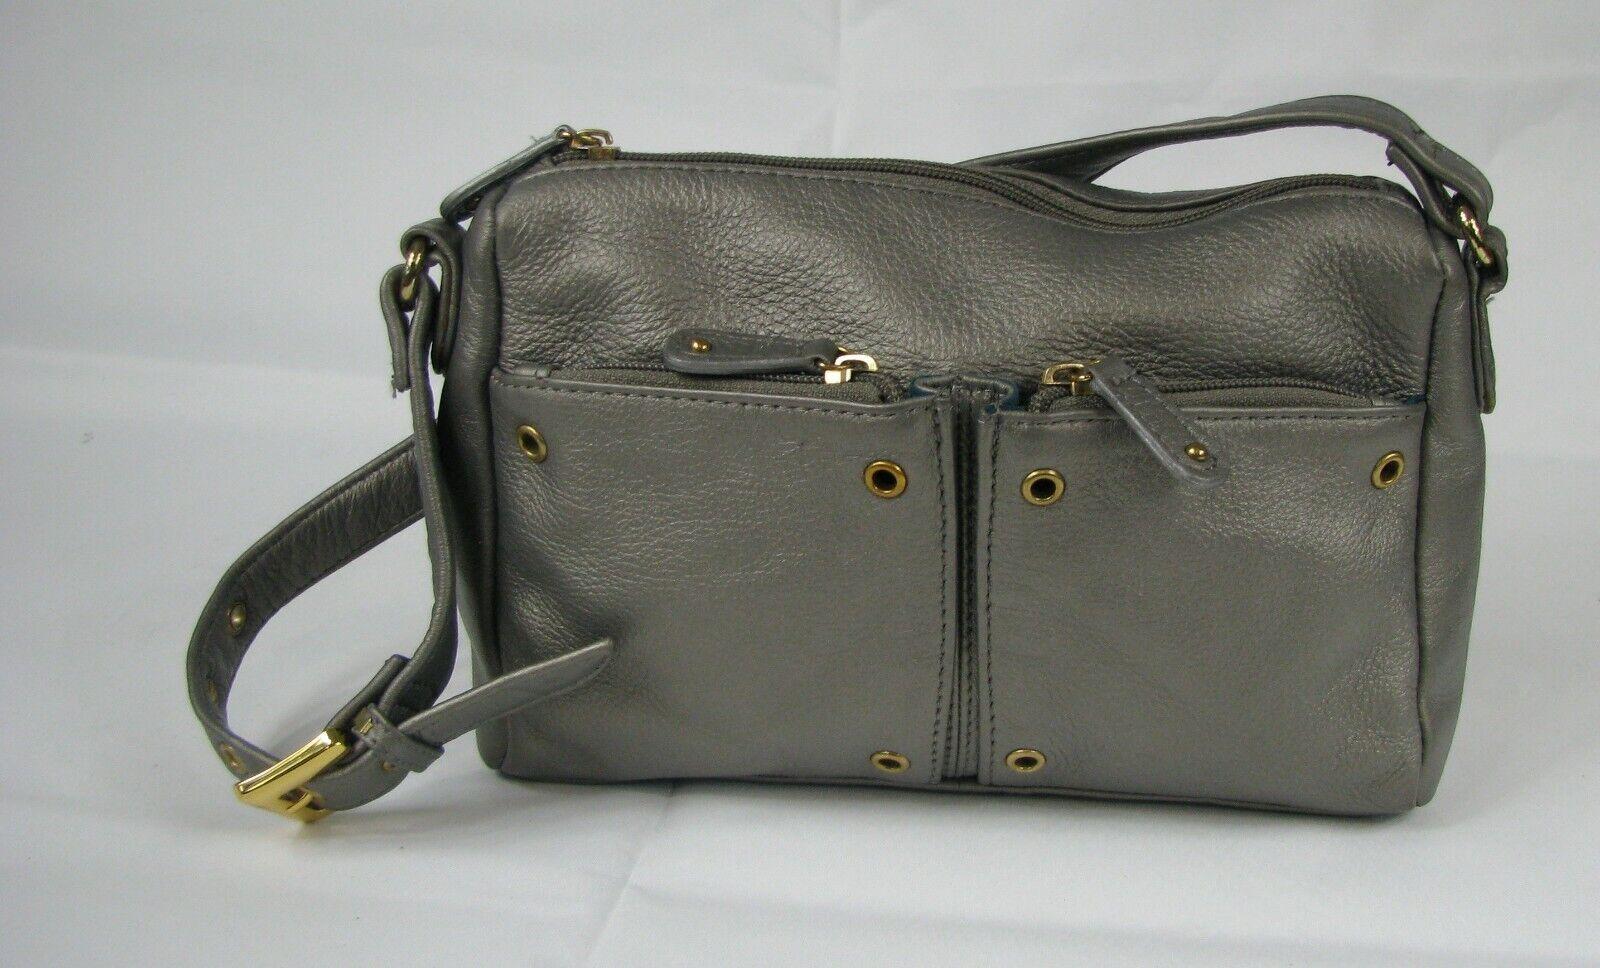 Stone Mountain Silver Gray Leather Small Handbag PURSE Over Shoulder Bag